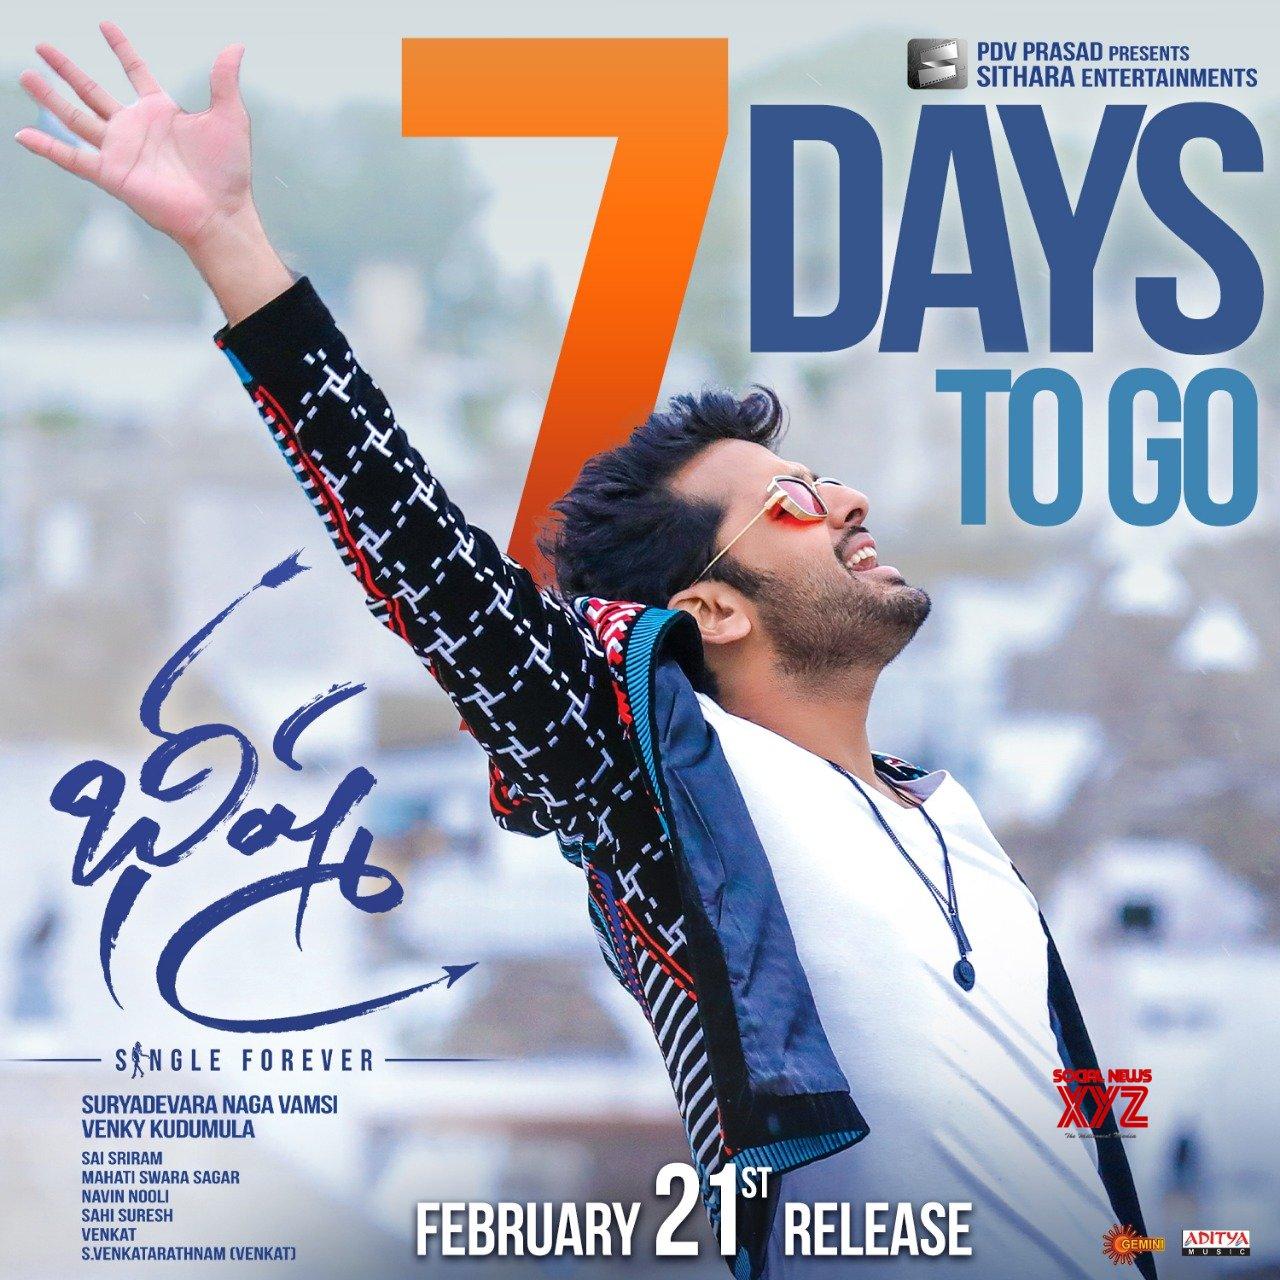 Nithiin And Rashmika Mandanna S Bheeshma Movie 7 Days To Go Poster Social News Xyz